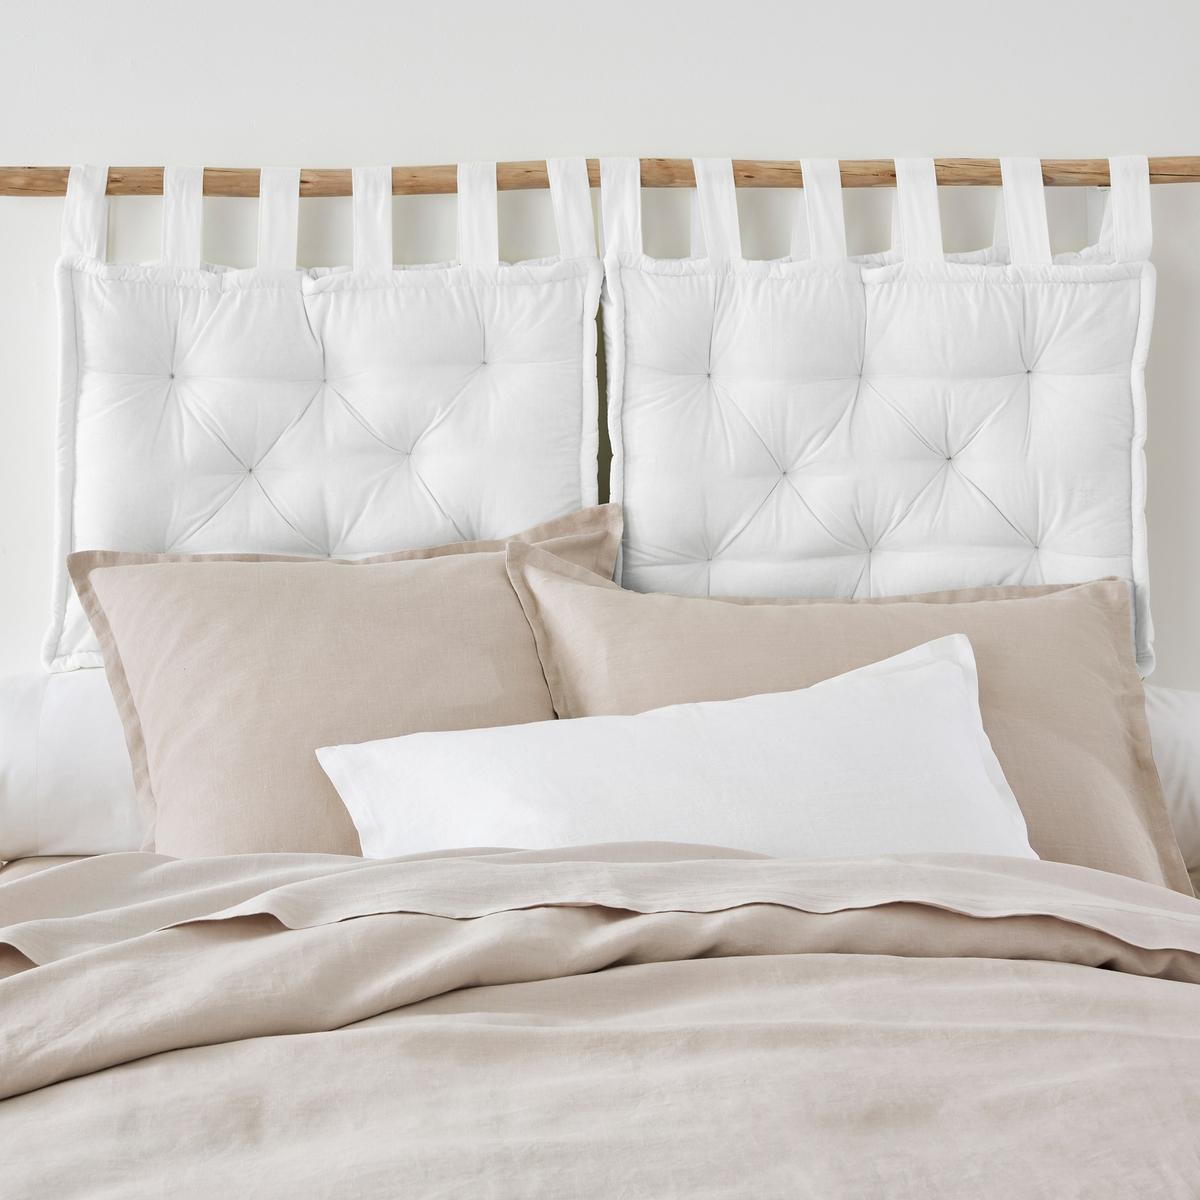 Подушка La Redoute Для изголовья кровати 50 x 70 см белый подушка набивная для изголовья кровати aeri